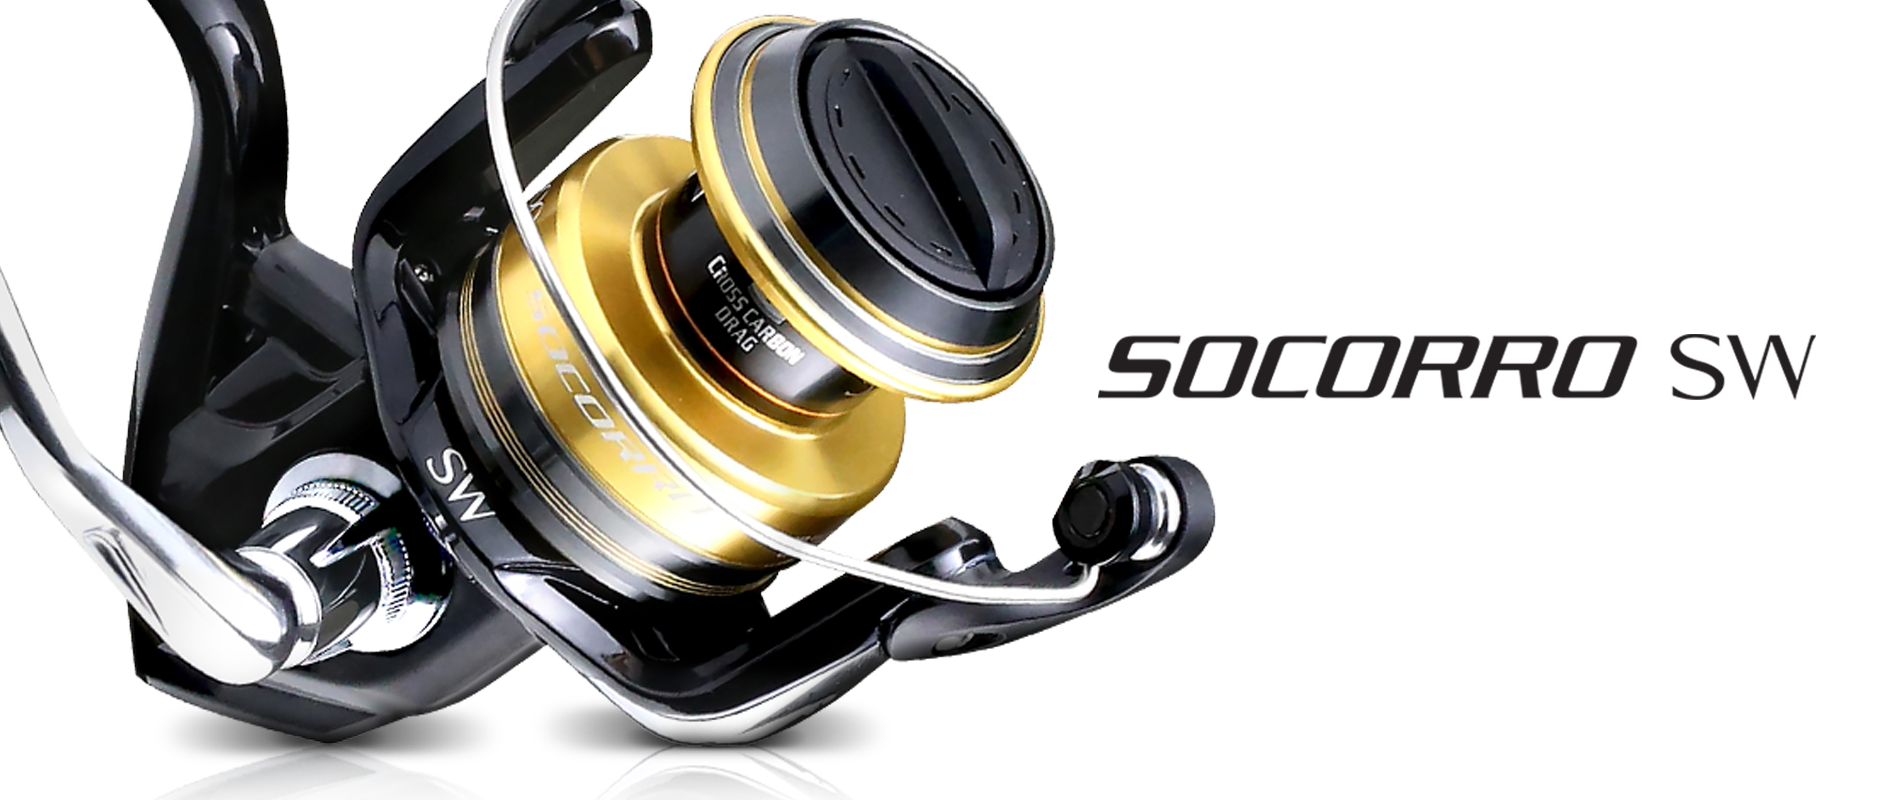 socorro_sw_5000